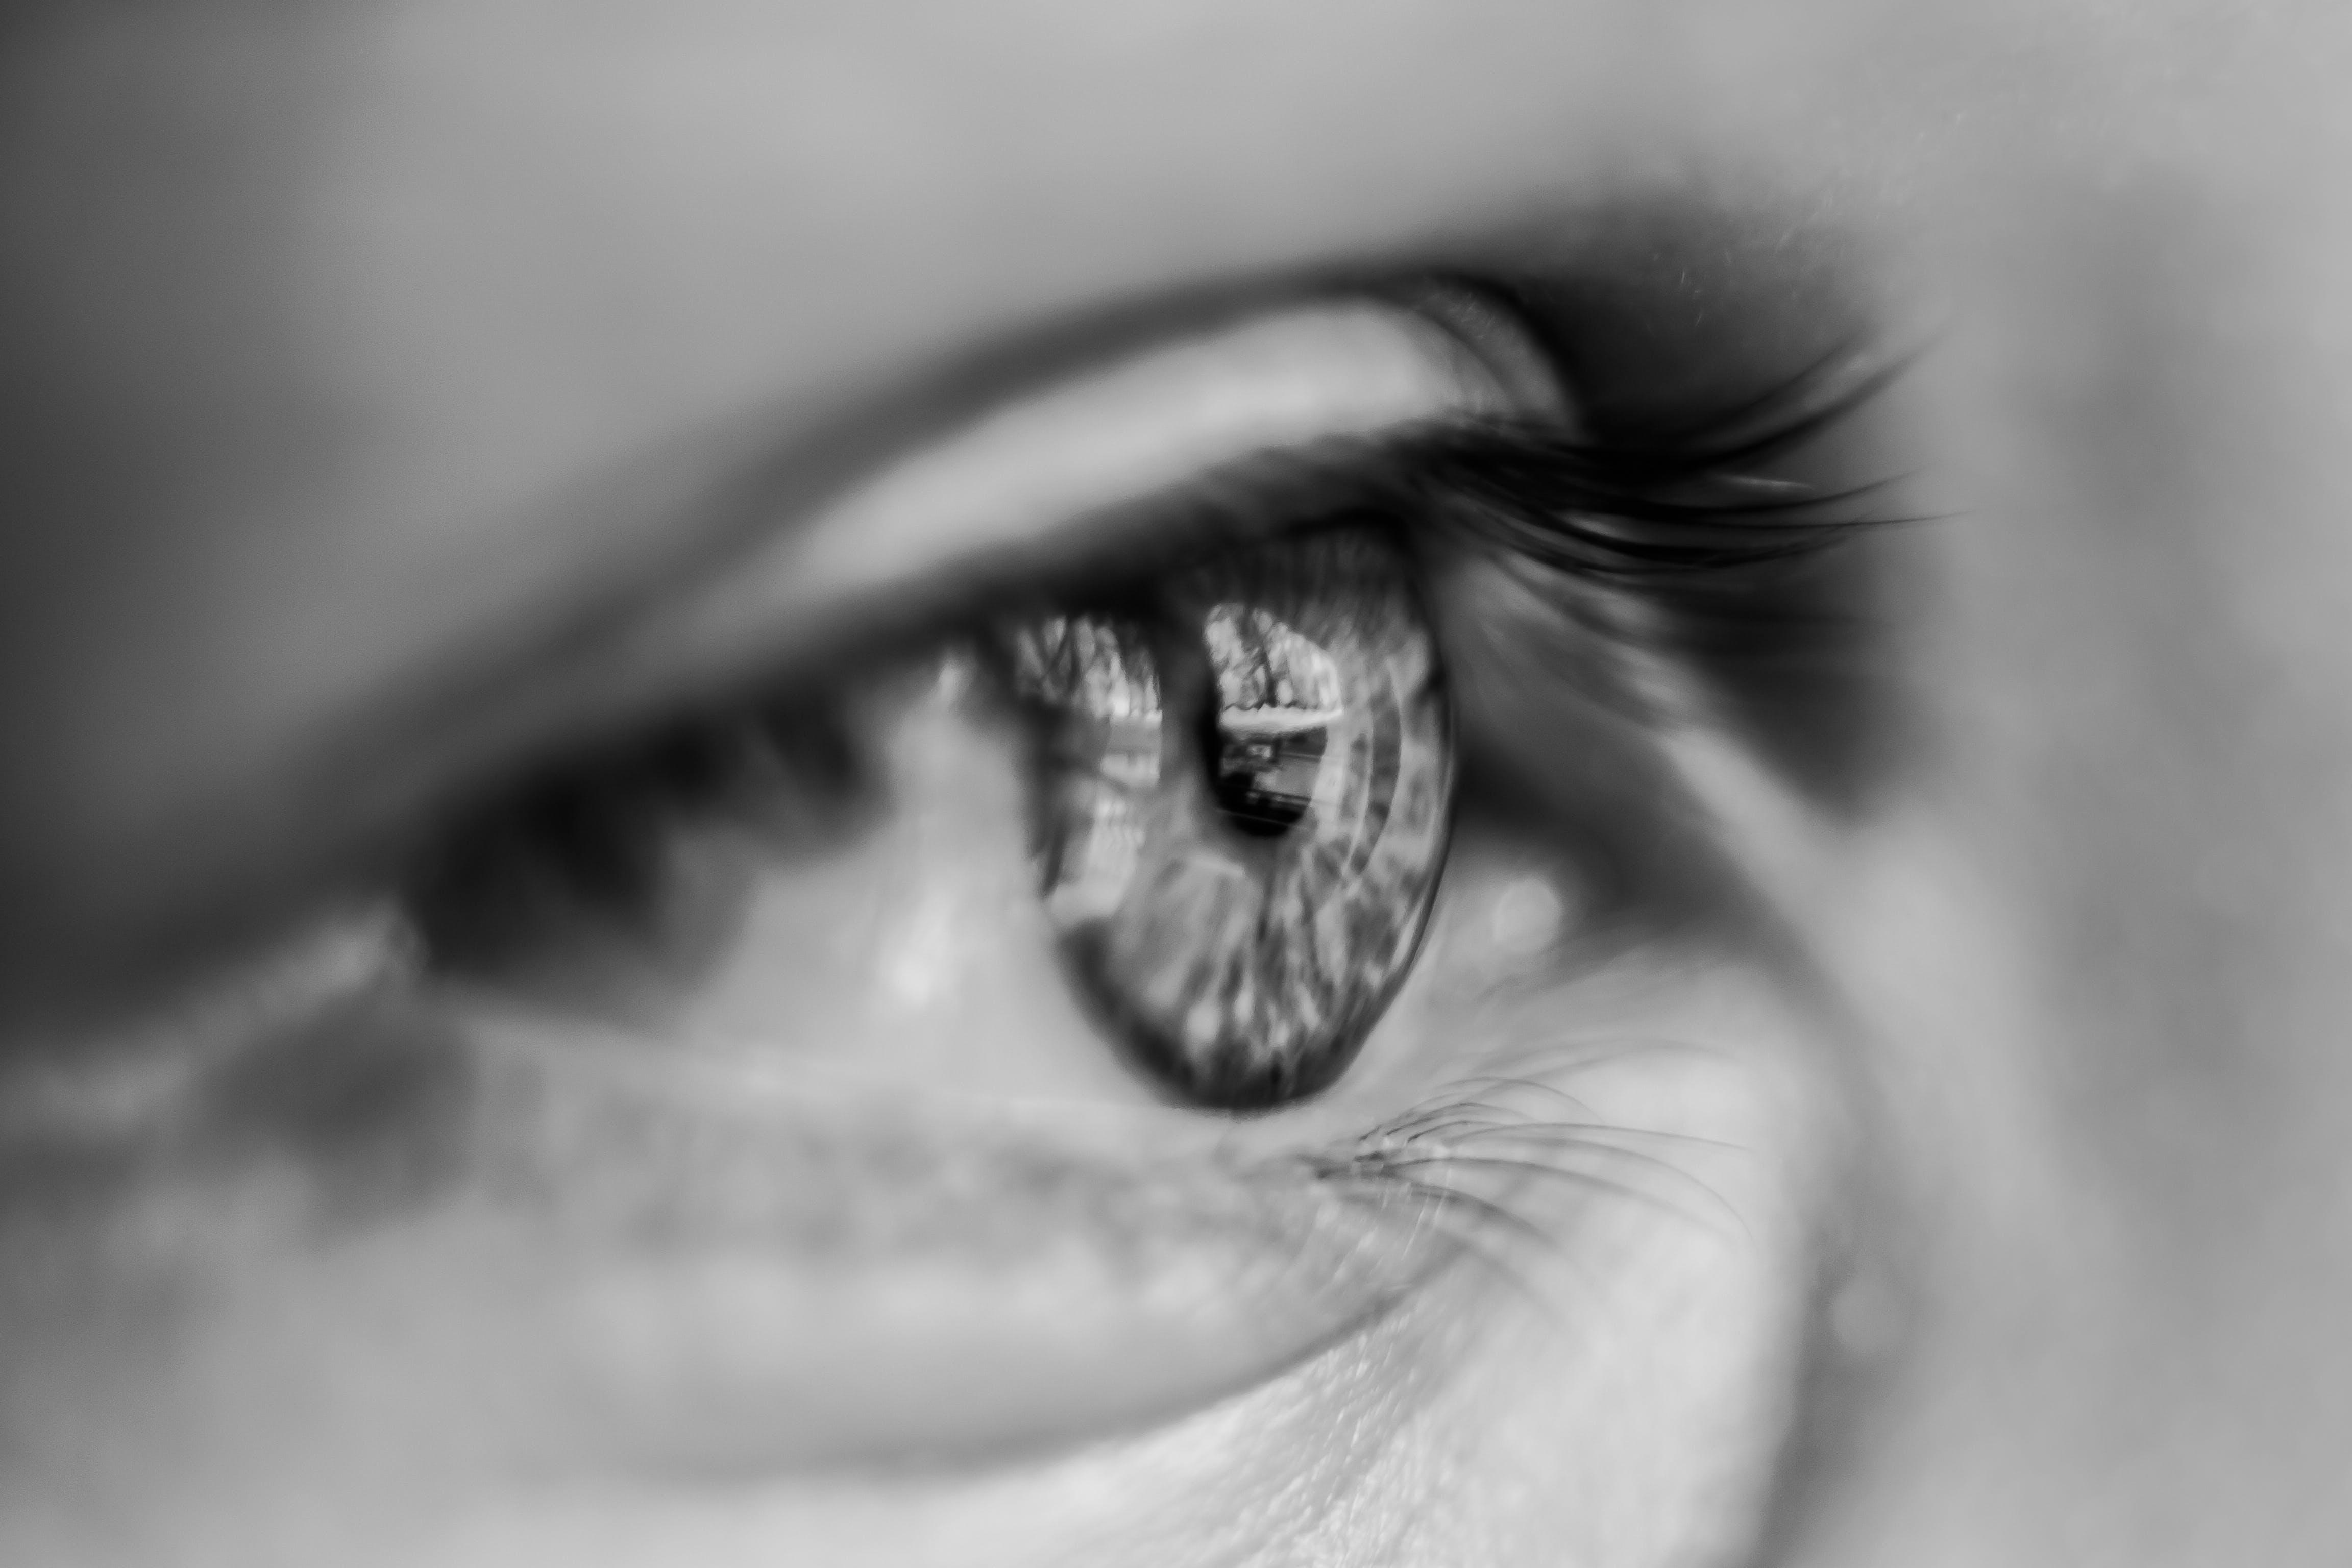 Grayscale Macro Photography of Person's Eye